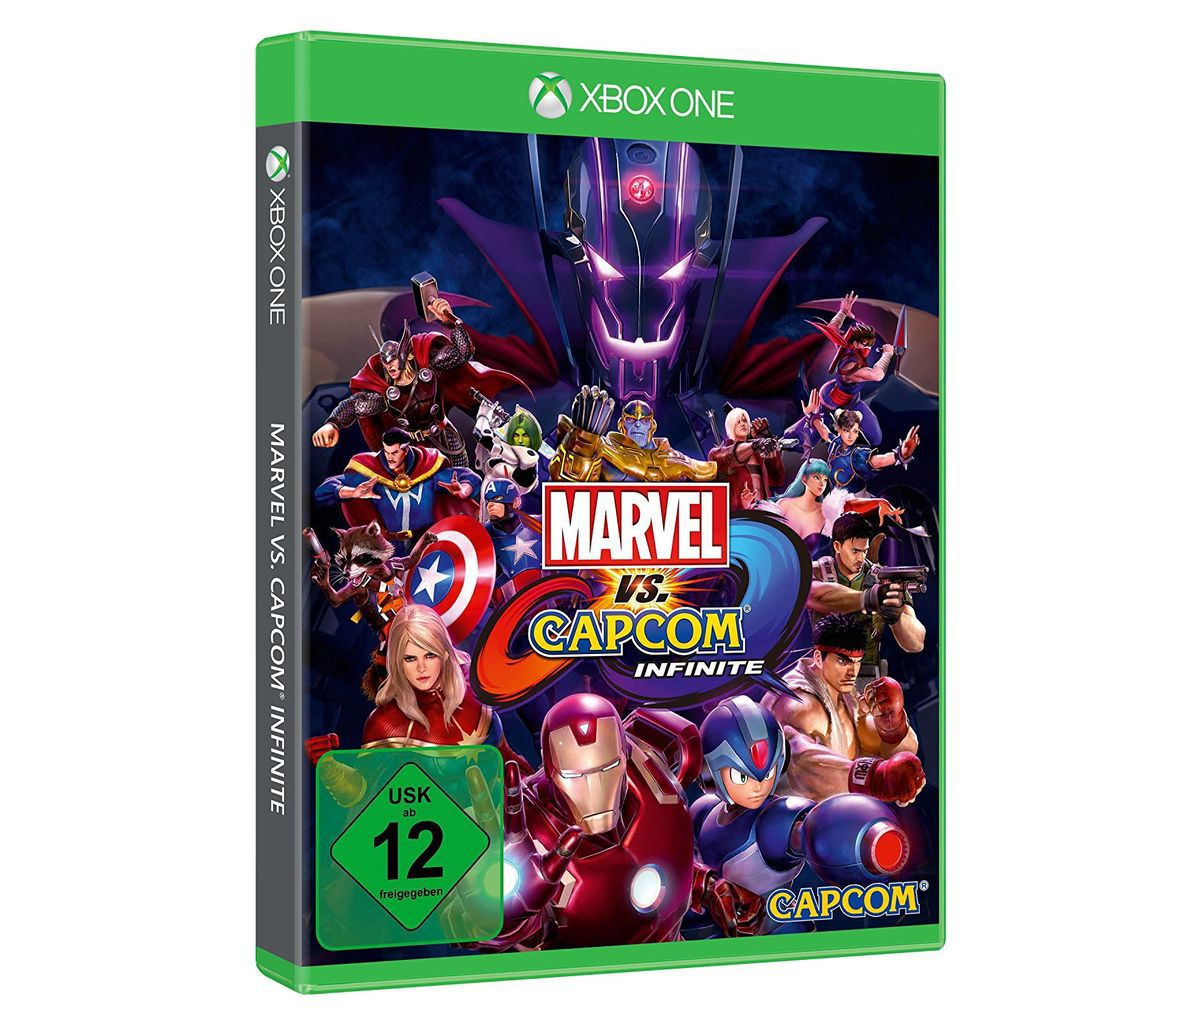 Capcom XBOX One - Spiel »Marvel vs Capcom Infin...